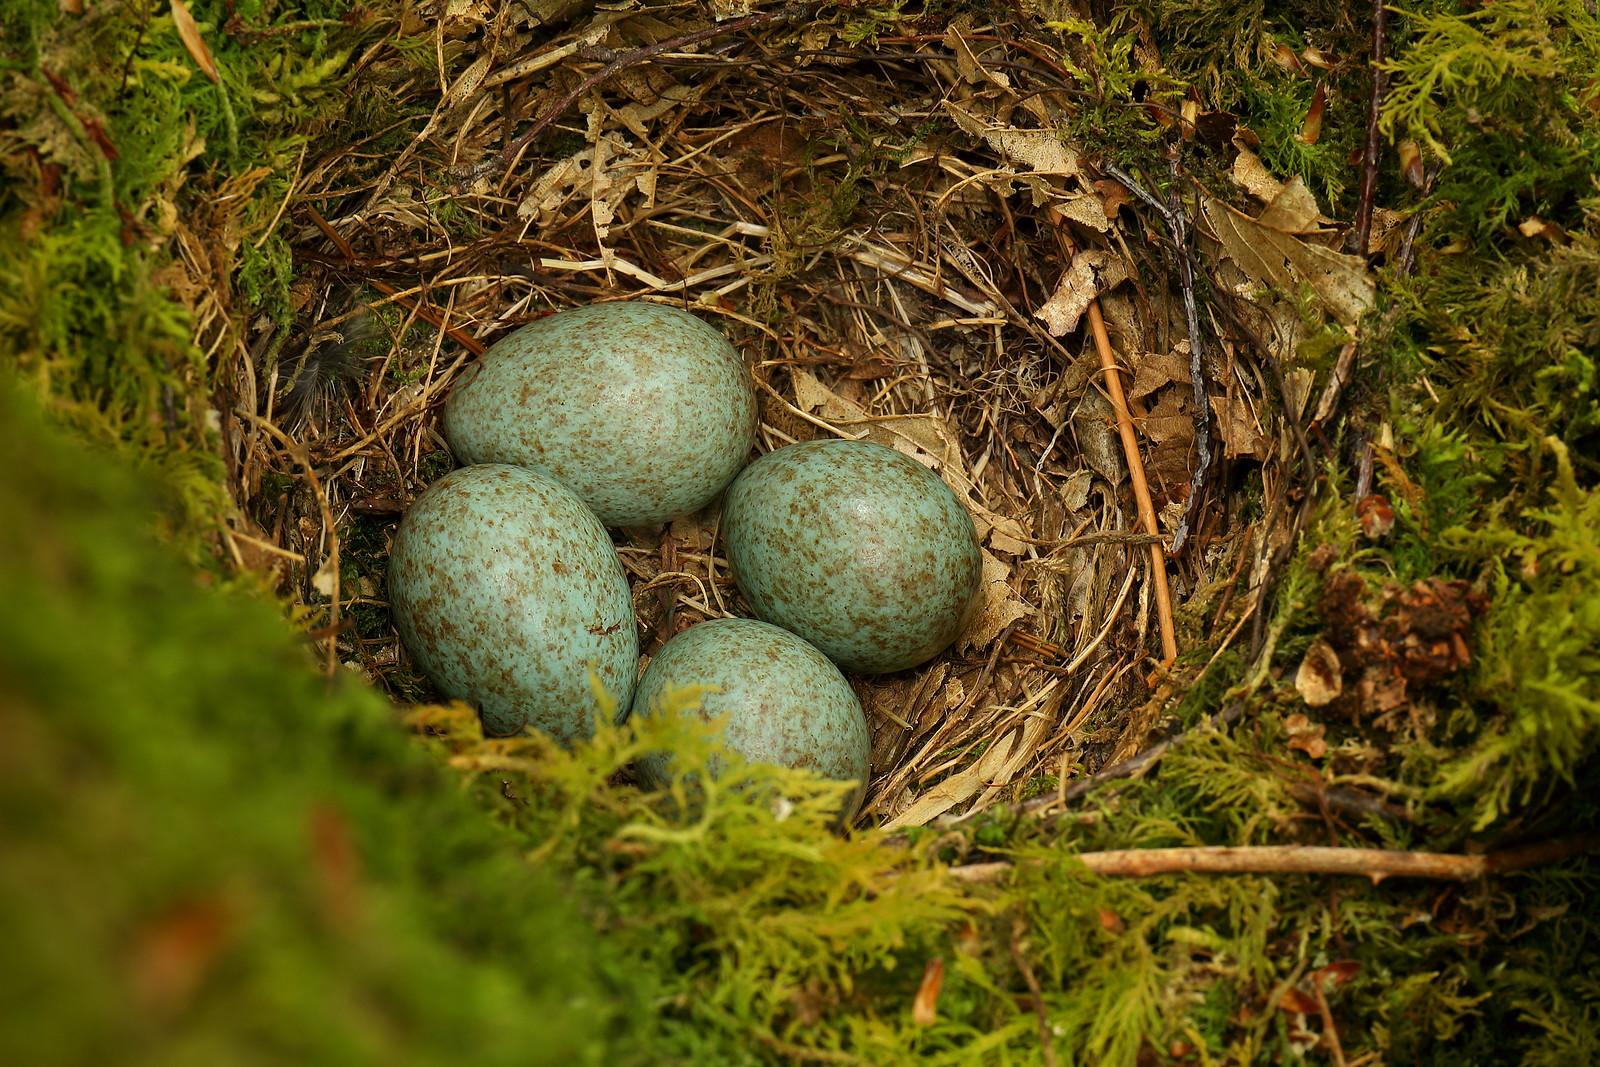 Blackbird Nest and Eggs, Abbot's Wood